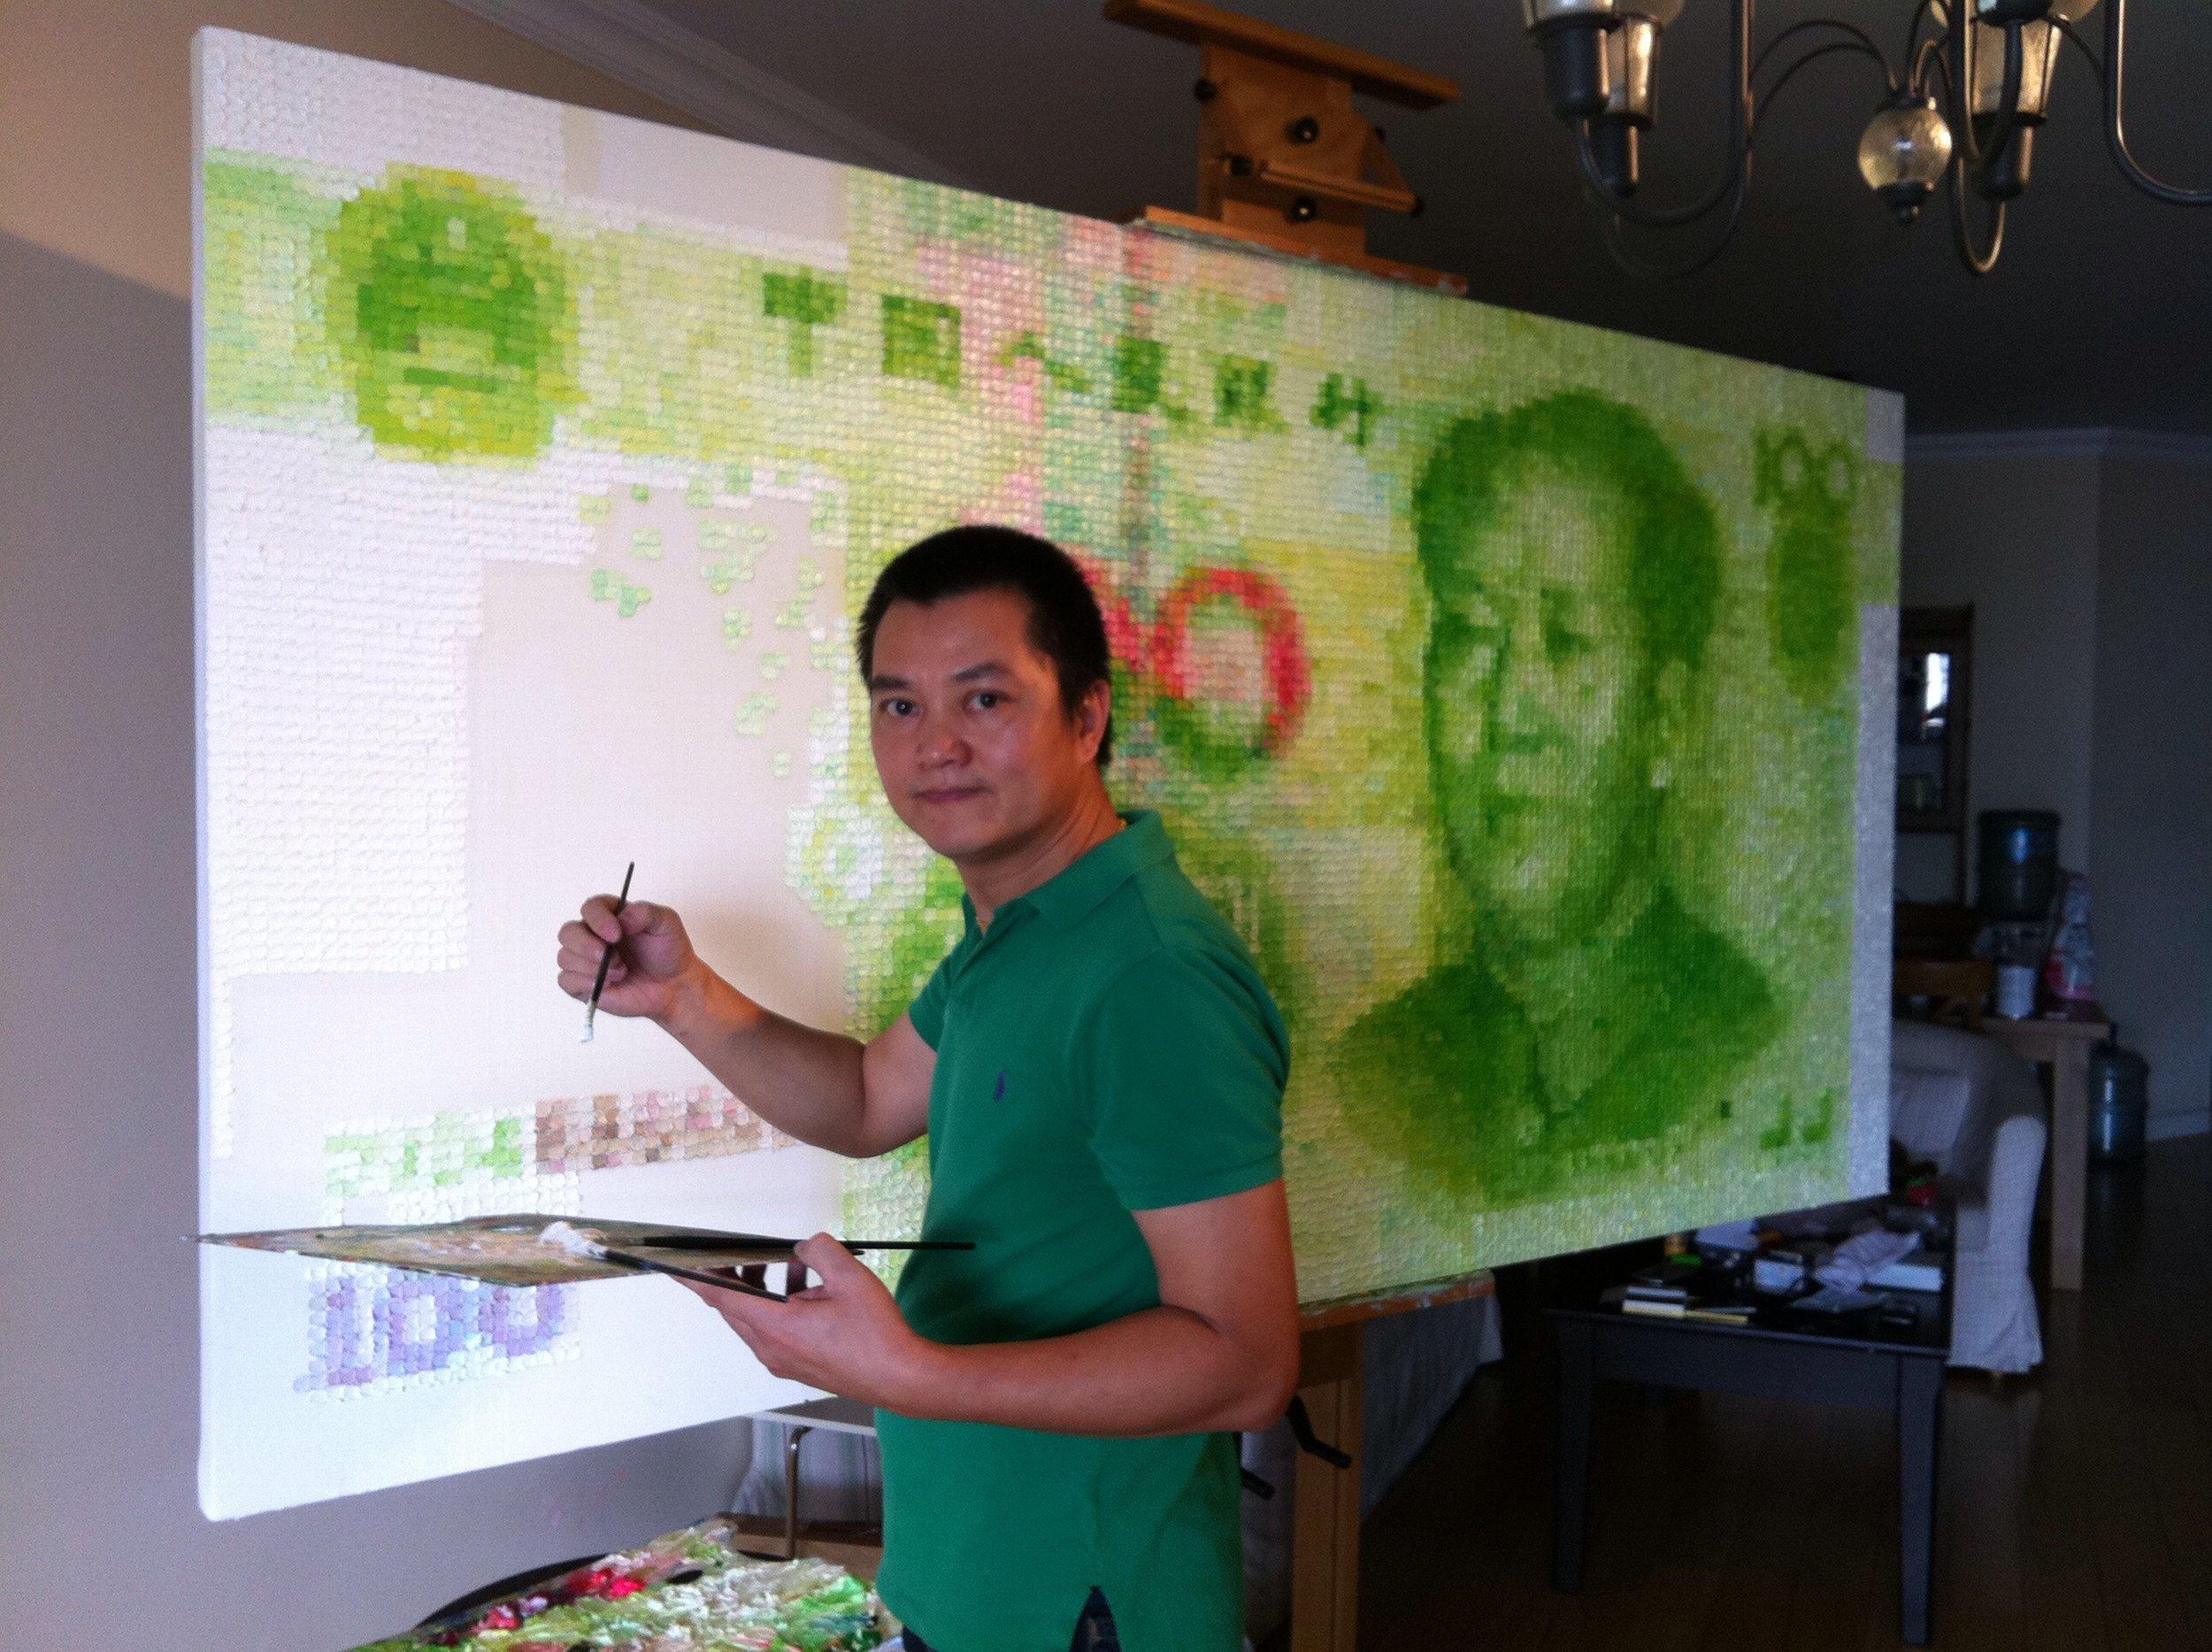 Working on RMB #4, Beijing, 2012